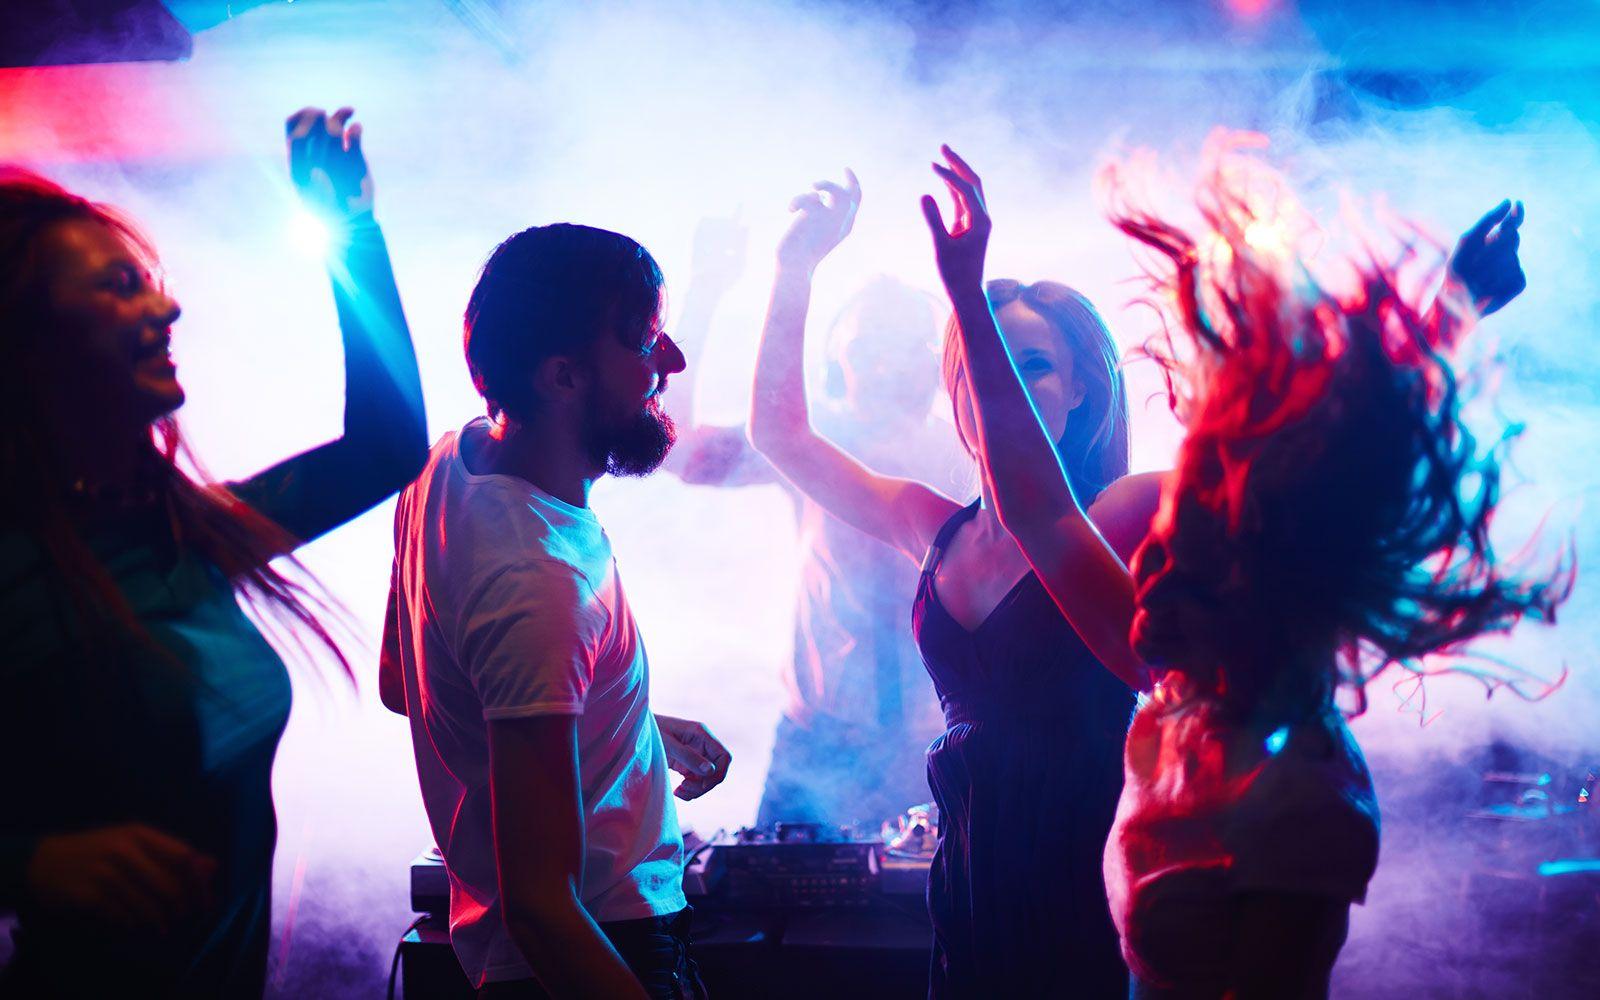 Pin By Margo Fray On Fiesta People Dancing Night Club Night Life